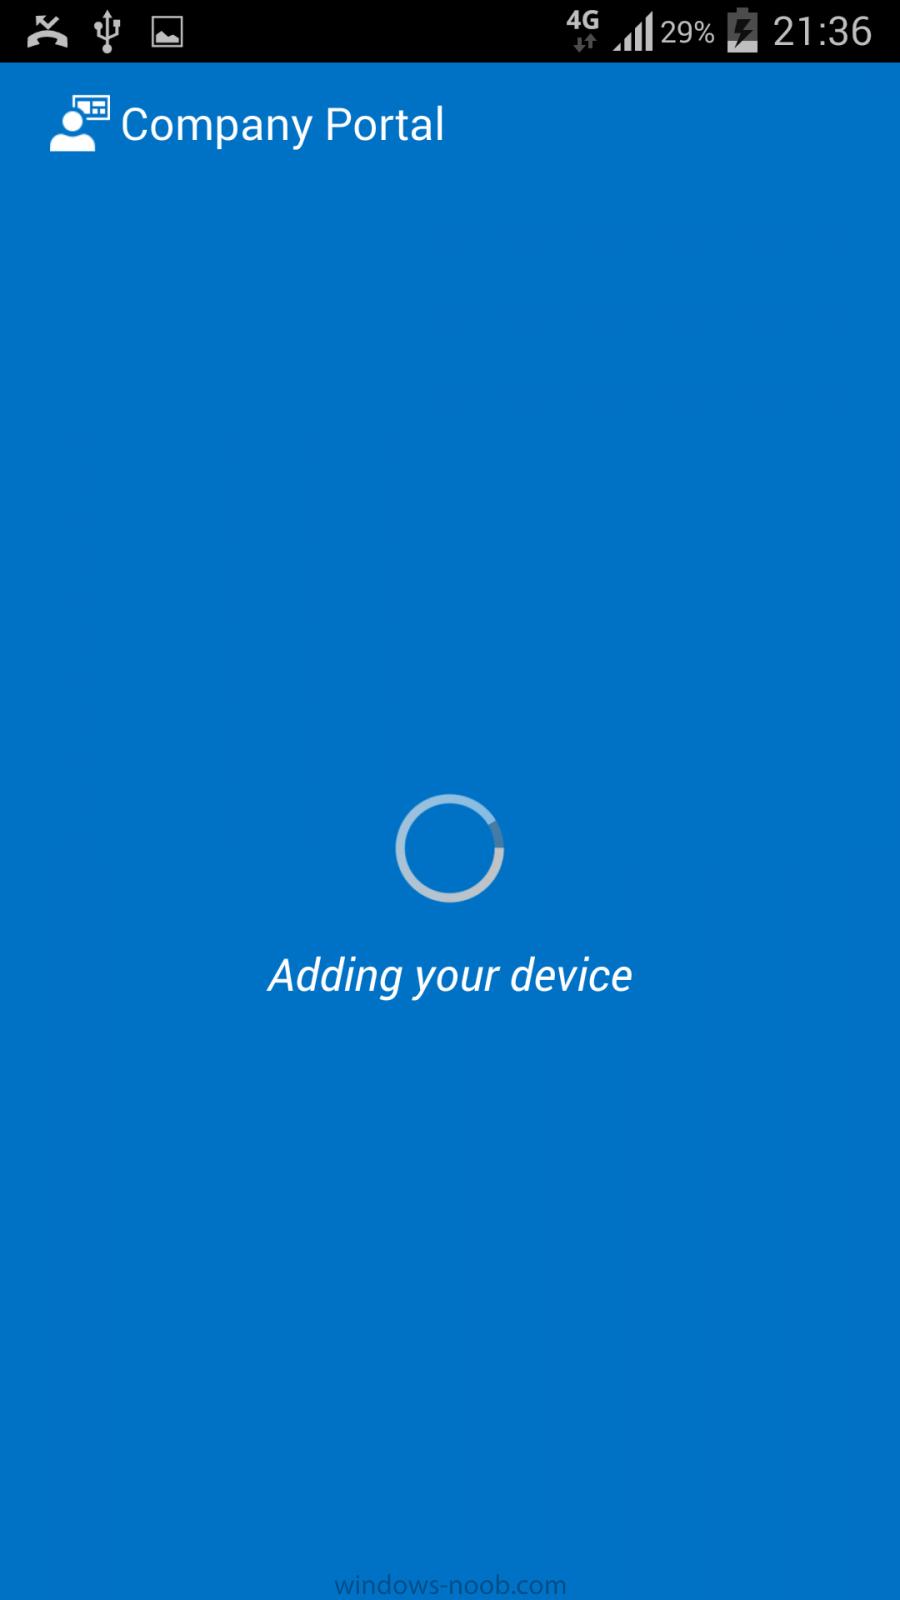 Screenshot_2014-04-01-21-36-35.png